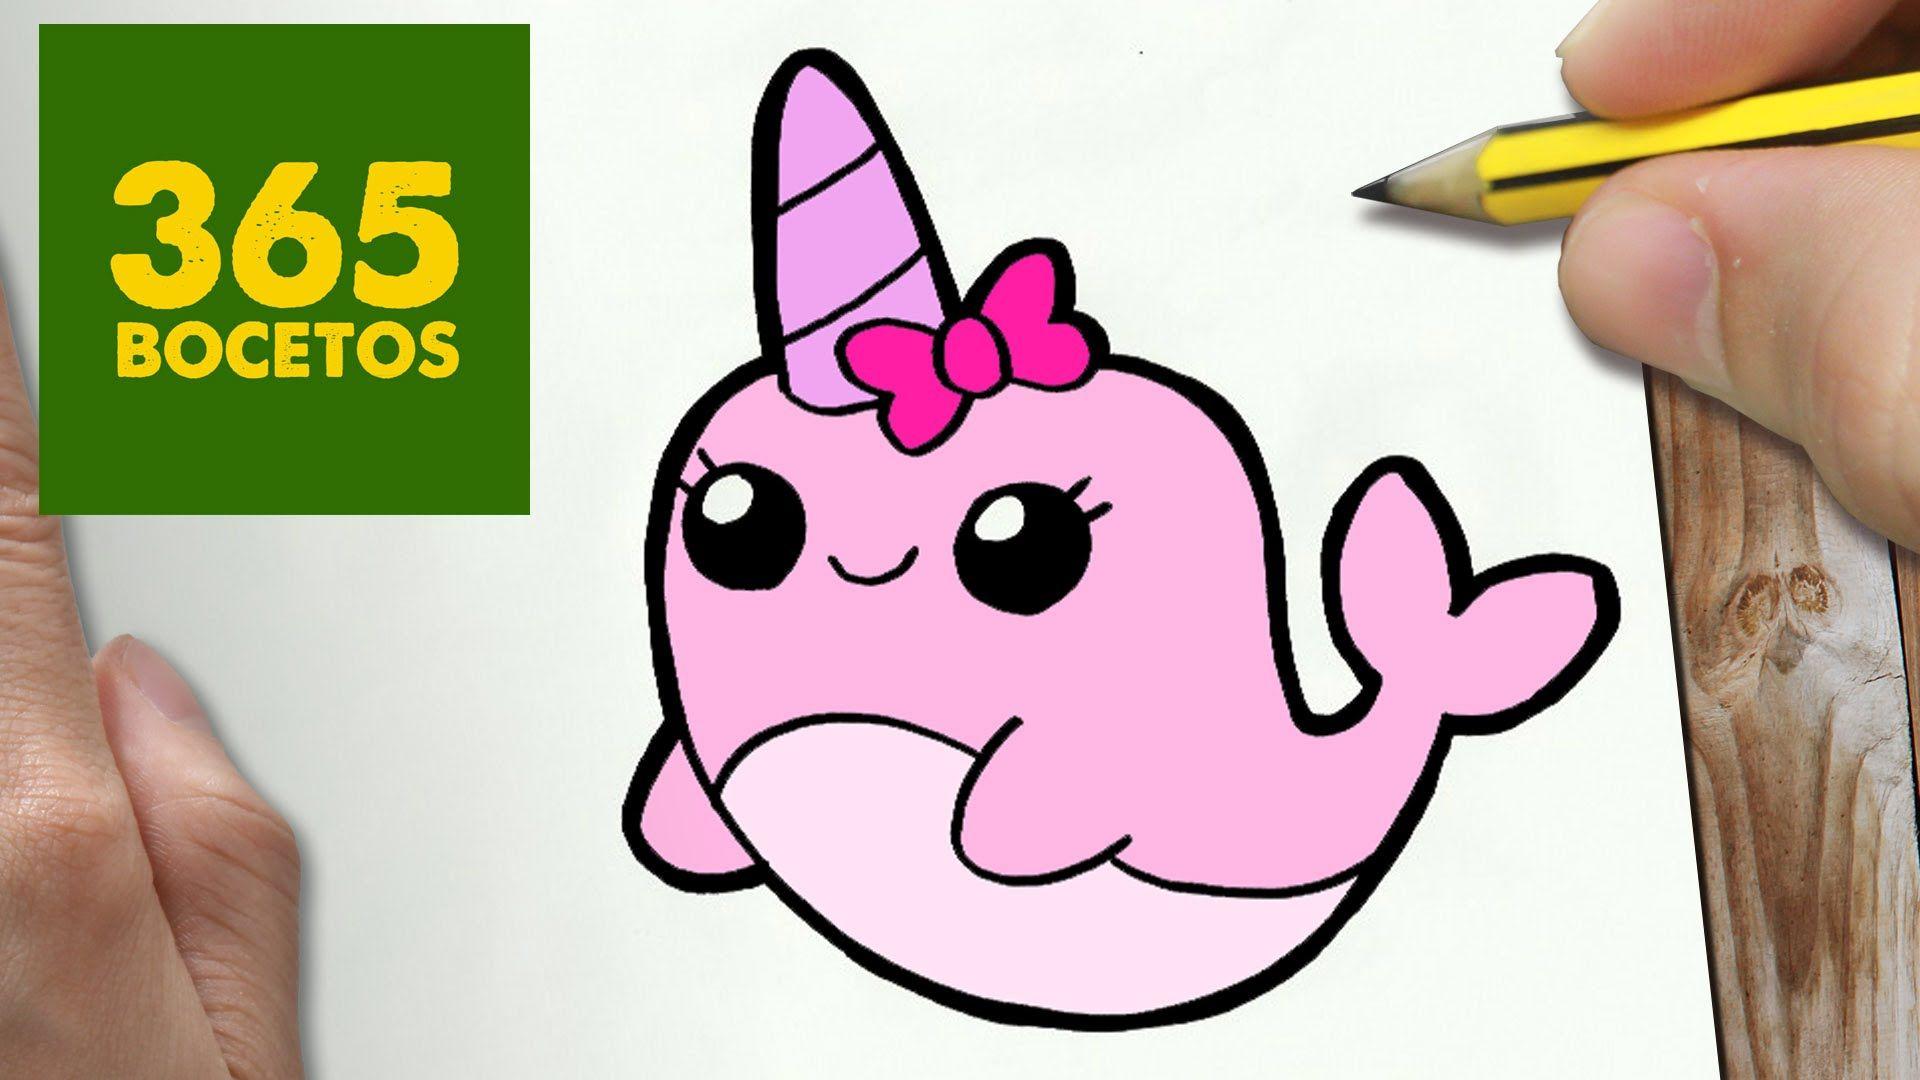 Como Dibujar Narval Kawaii Paso A Paso Dibujos Kawaii Faciles How To Draw A Narwhal Youtube Dibujos Kawaii Dibujos Kawaii Faciles Dibujos Kawaii 365